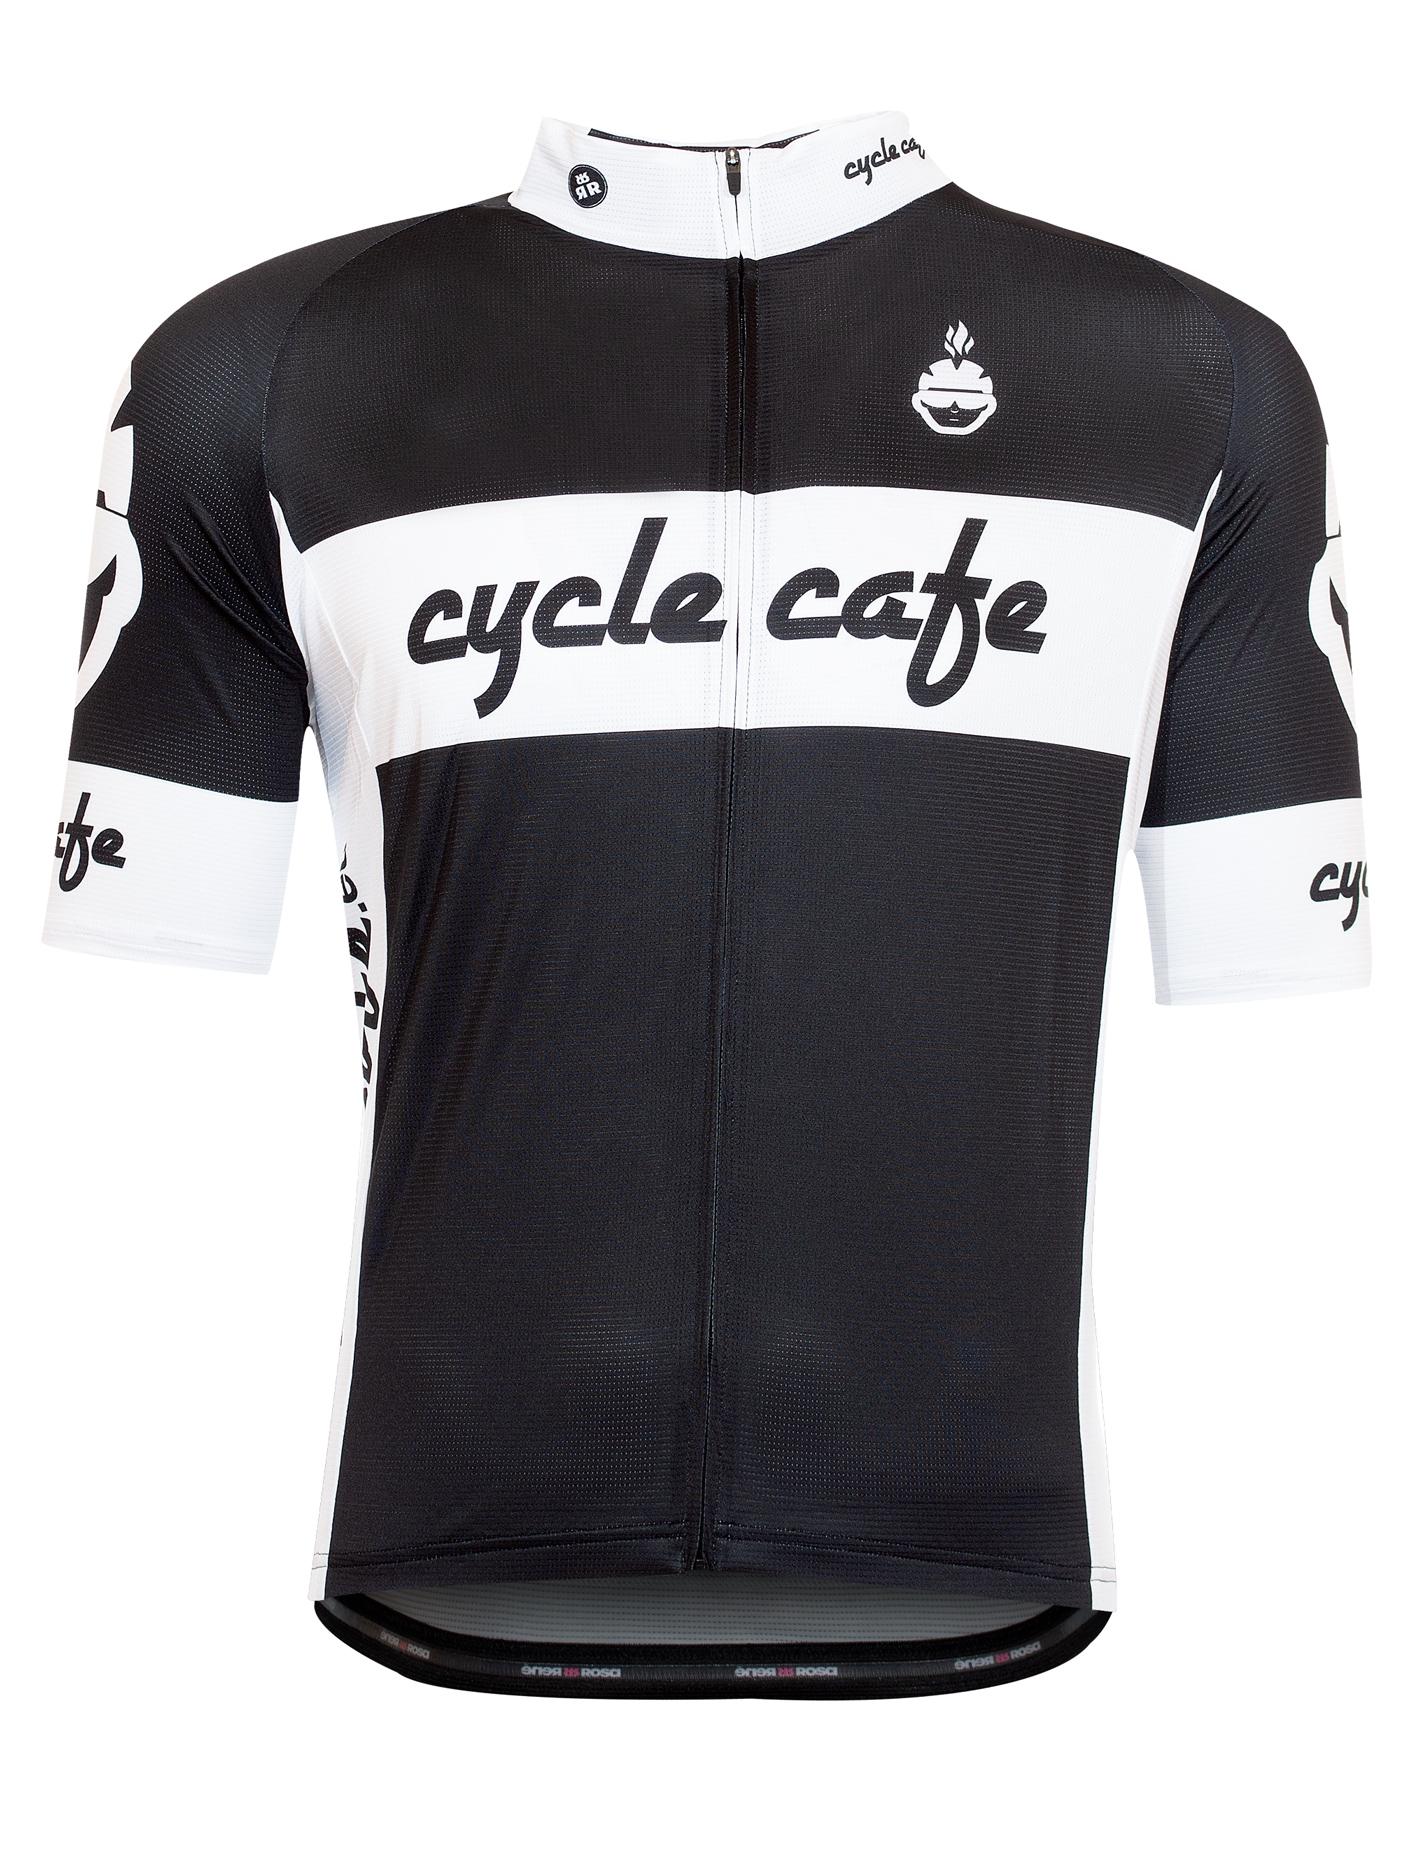 Kurzarm Radtrikot RRT047M / Cycle Cafe Classic Line